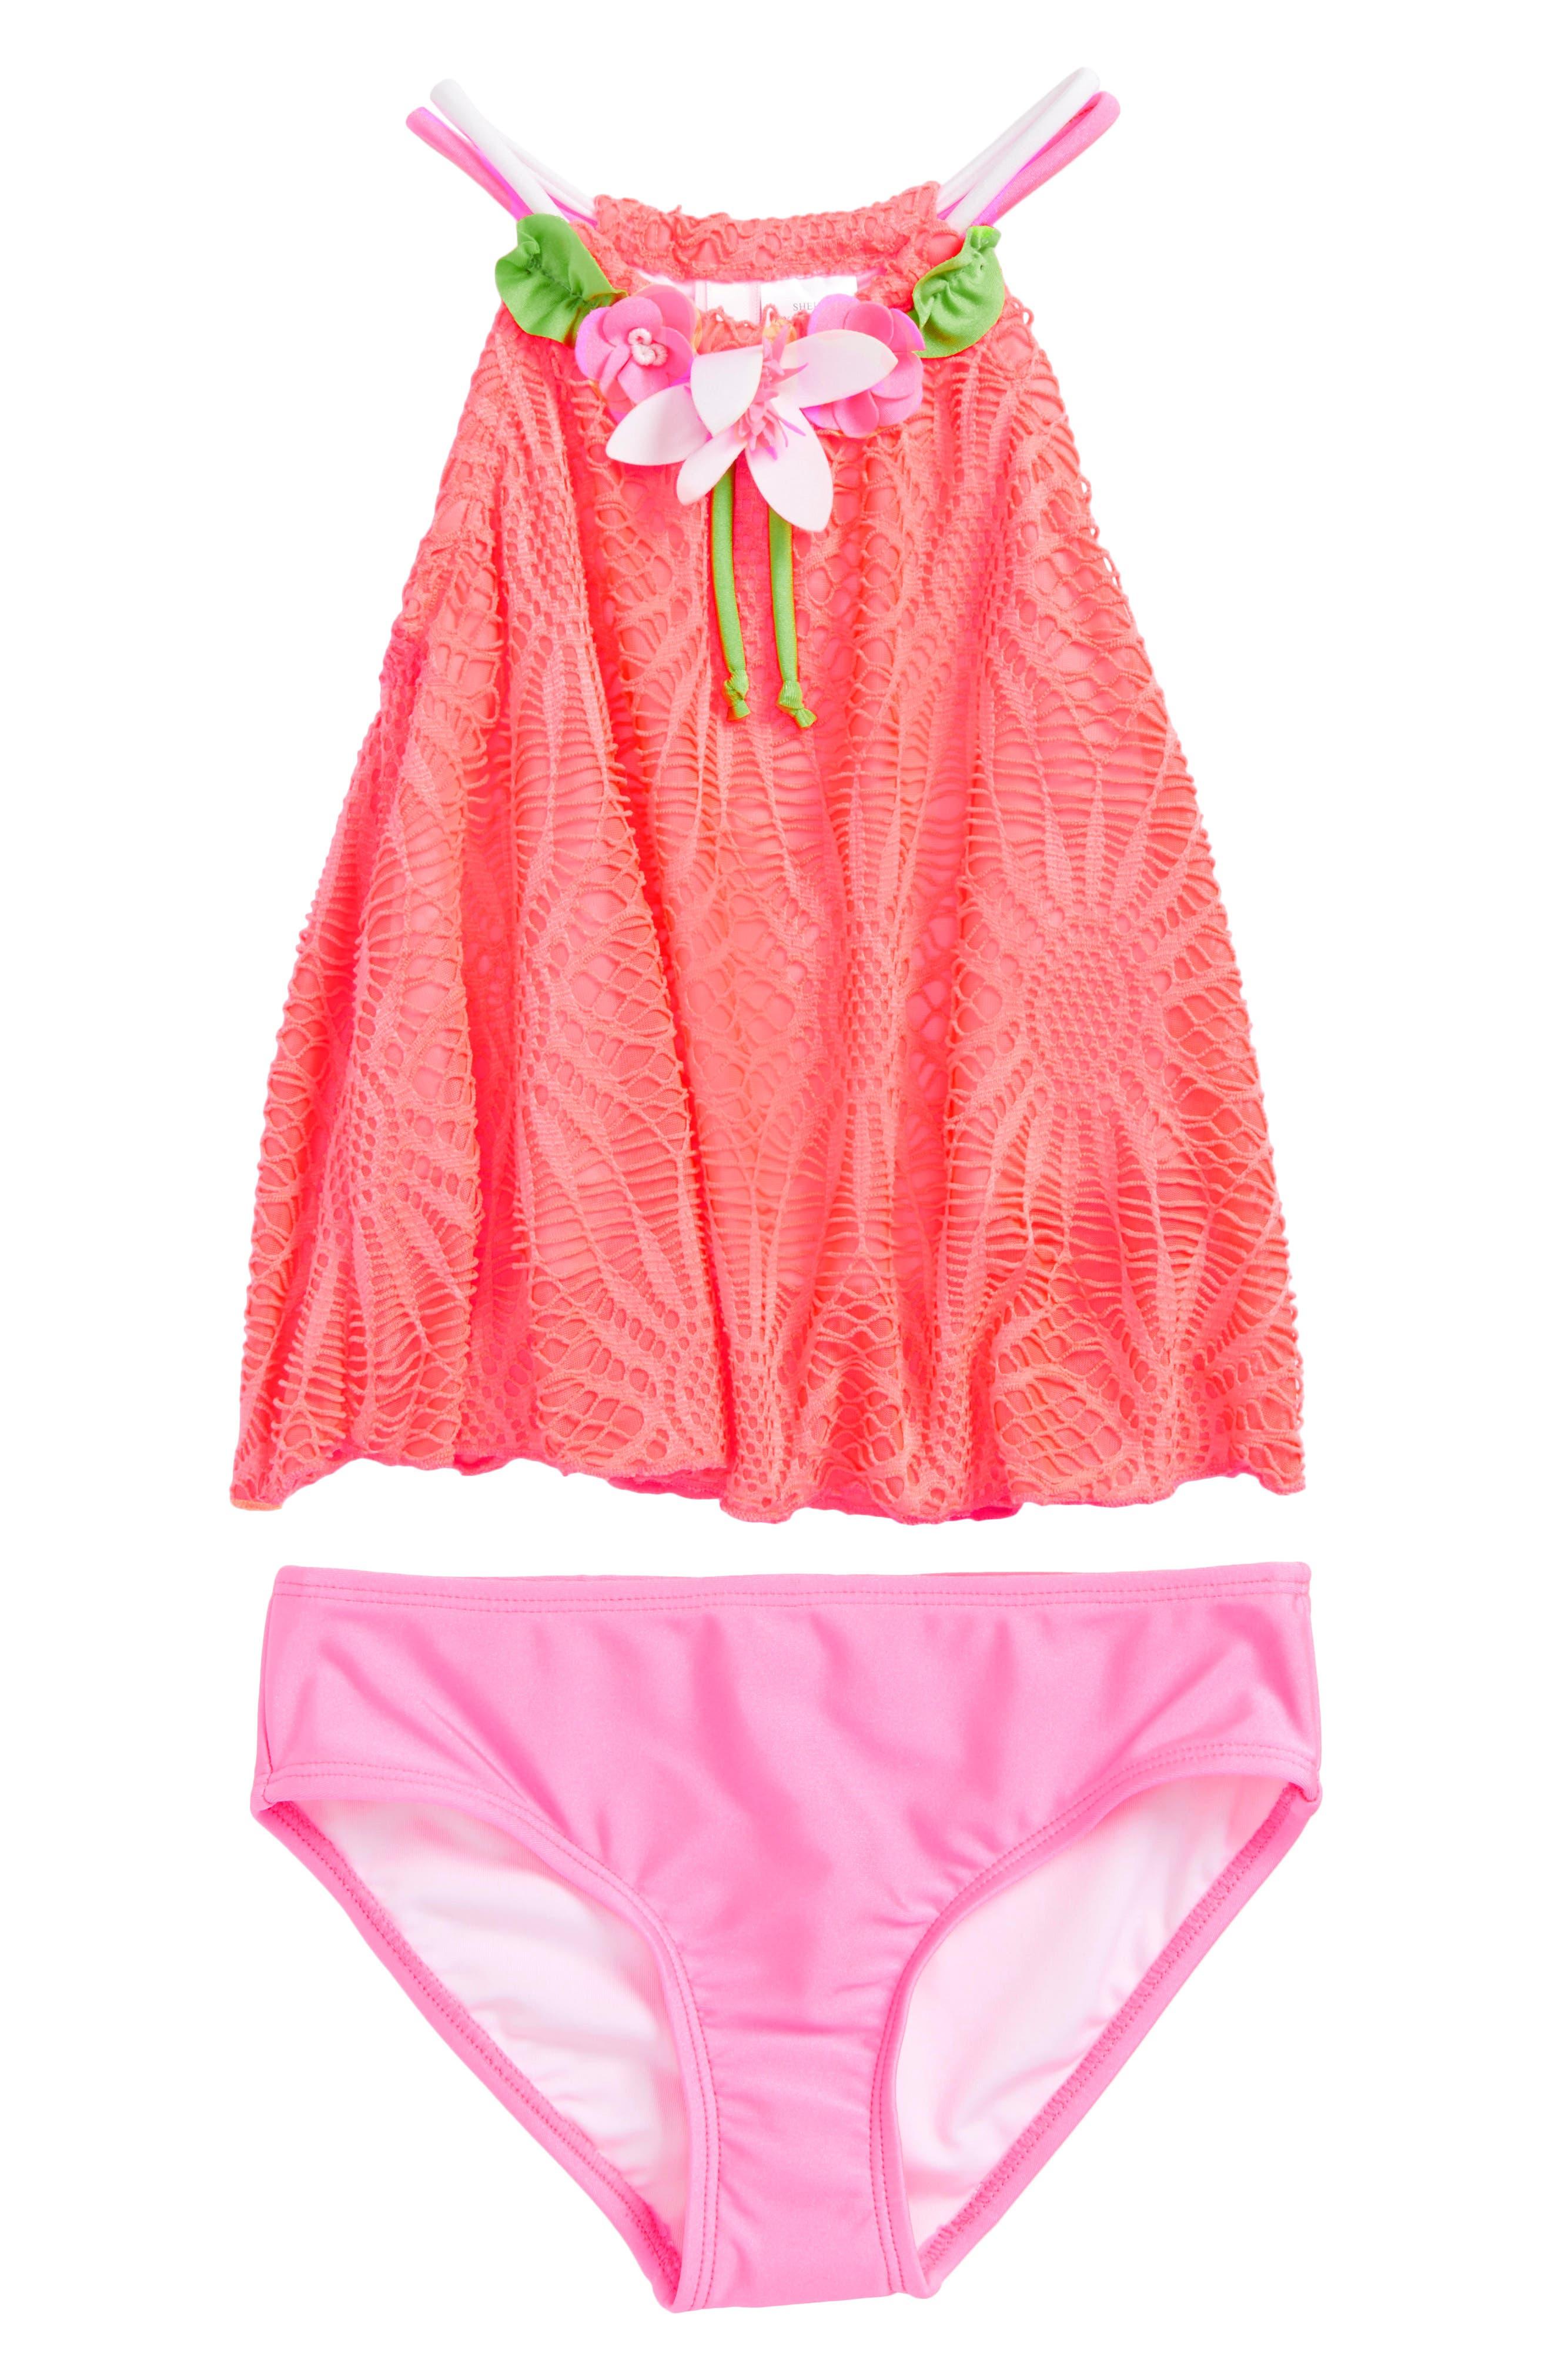 Alternate Image 1 Selected - Love U Lots Crochet Tankini Two-Piece Swimsuit (Toddler Girls & Little Girls)